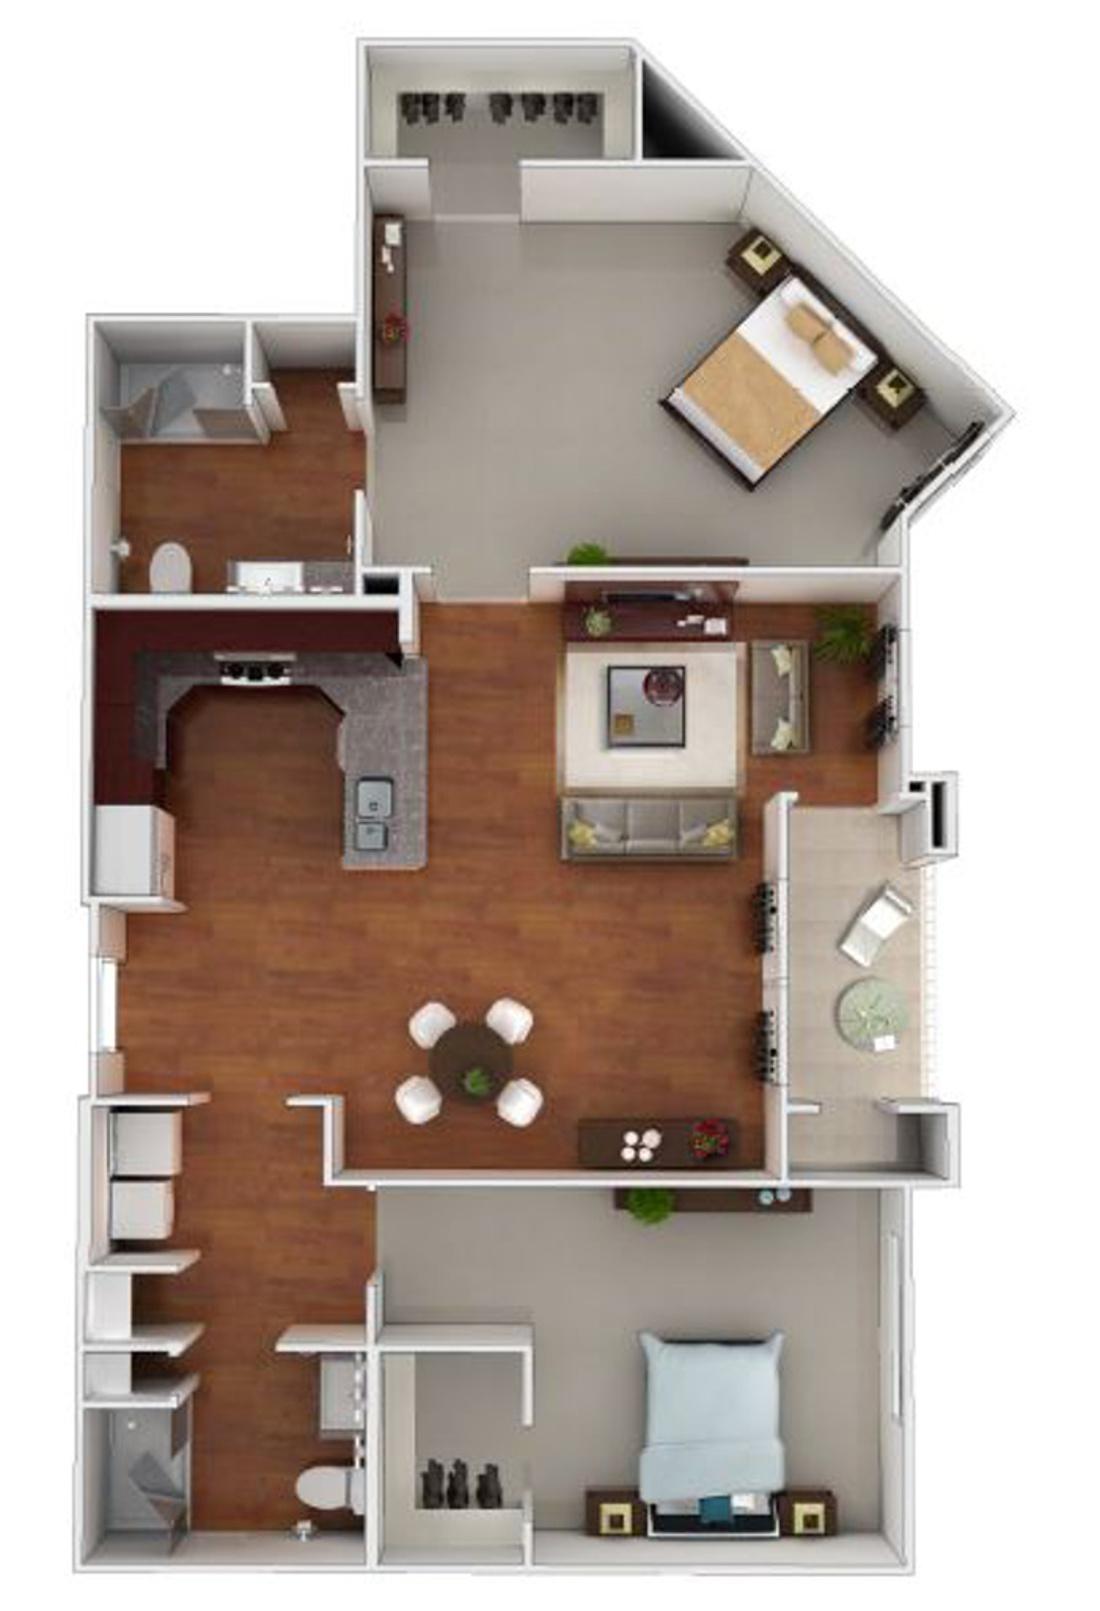 Larkspur at Twin Creeks 55+ Active Apartments - Floorplan - Bolinas